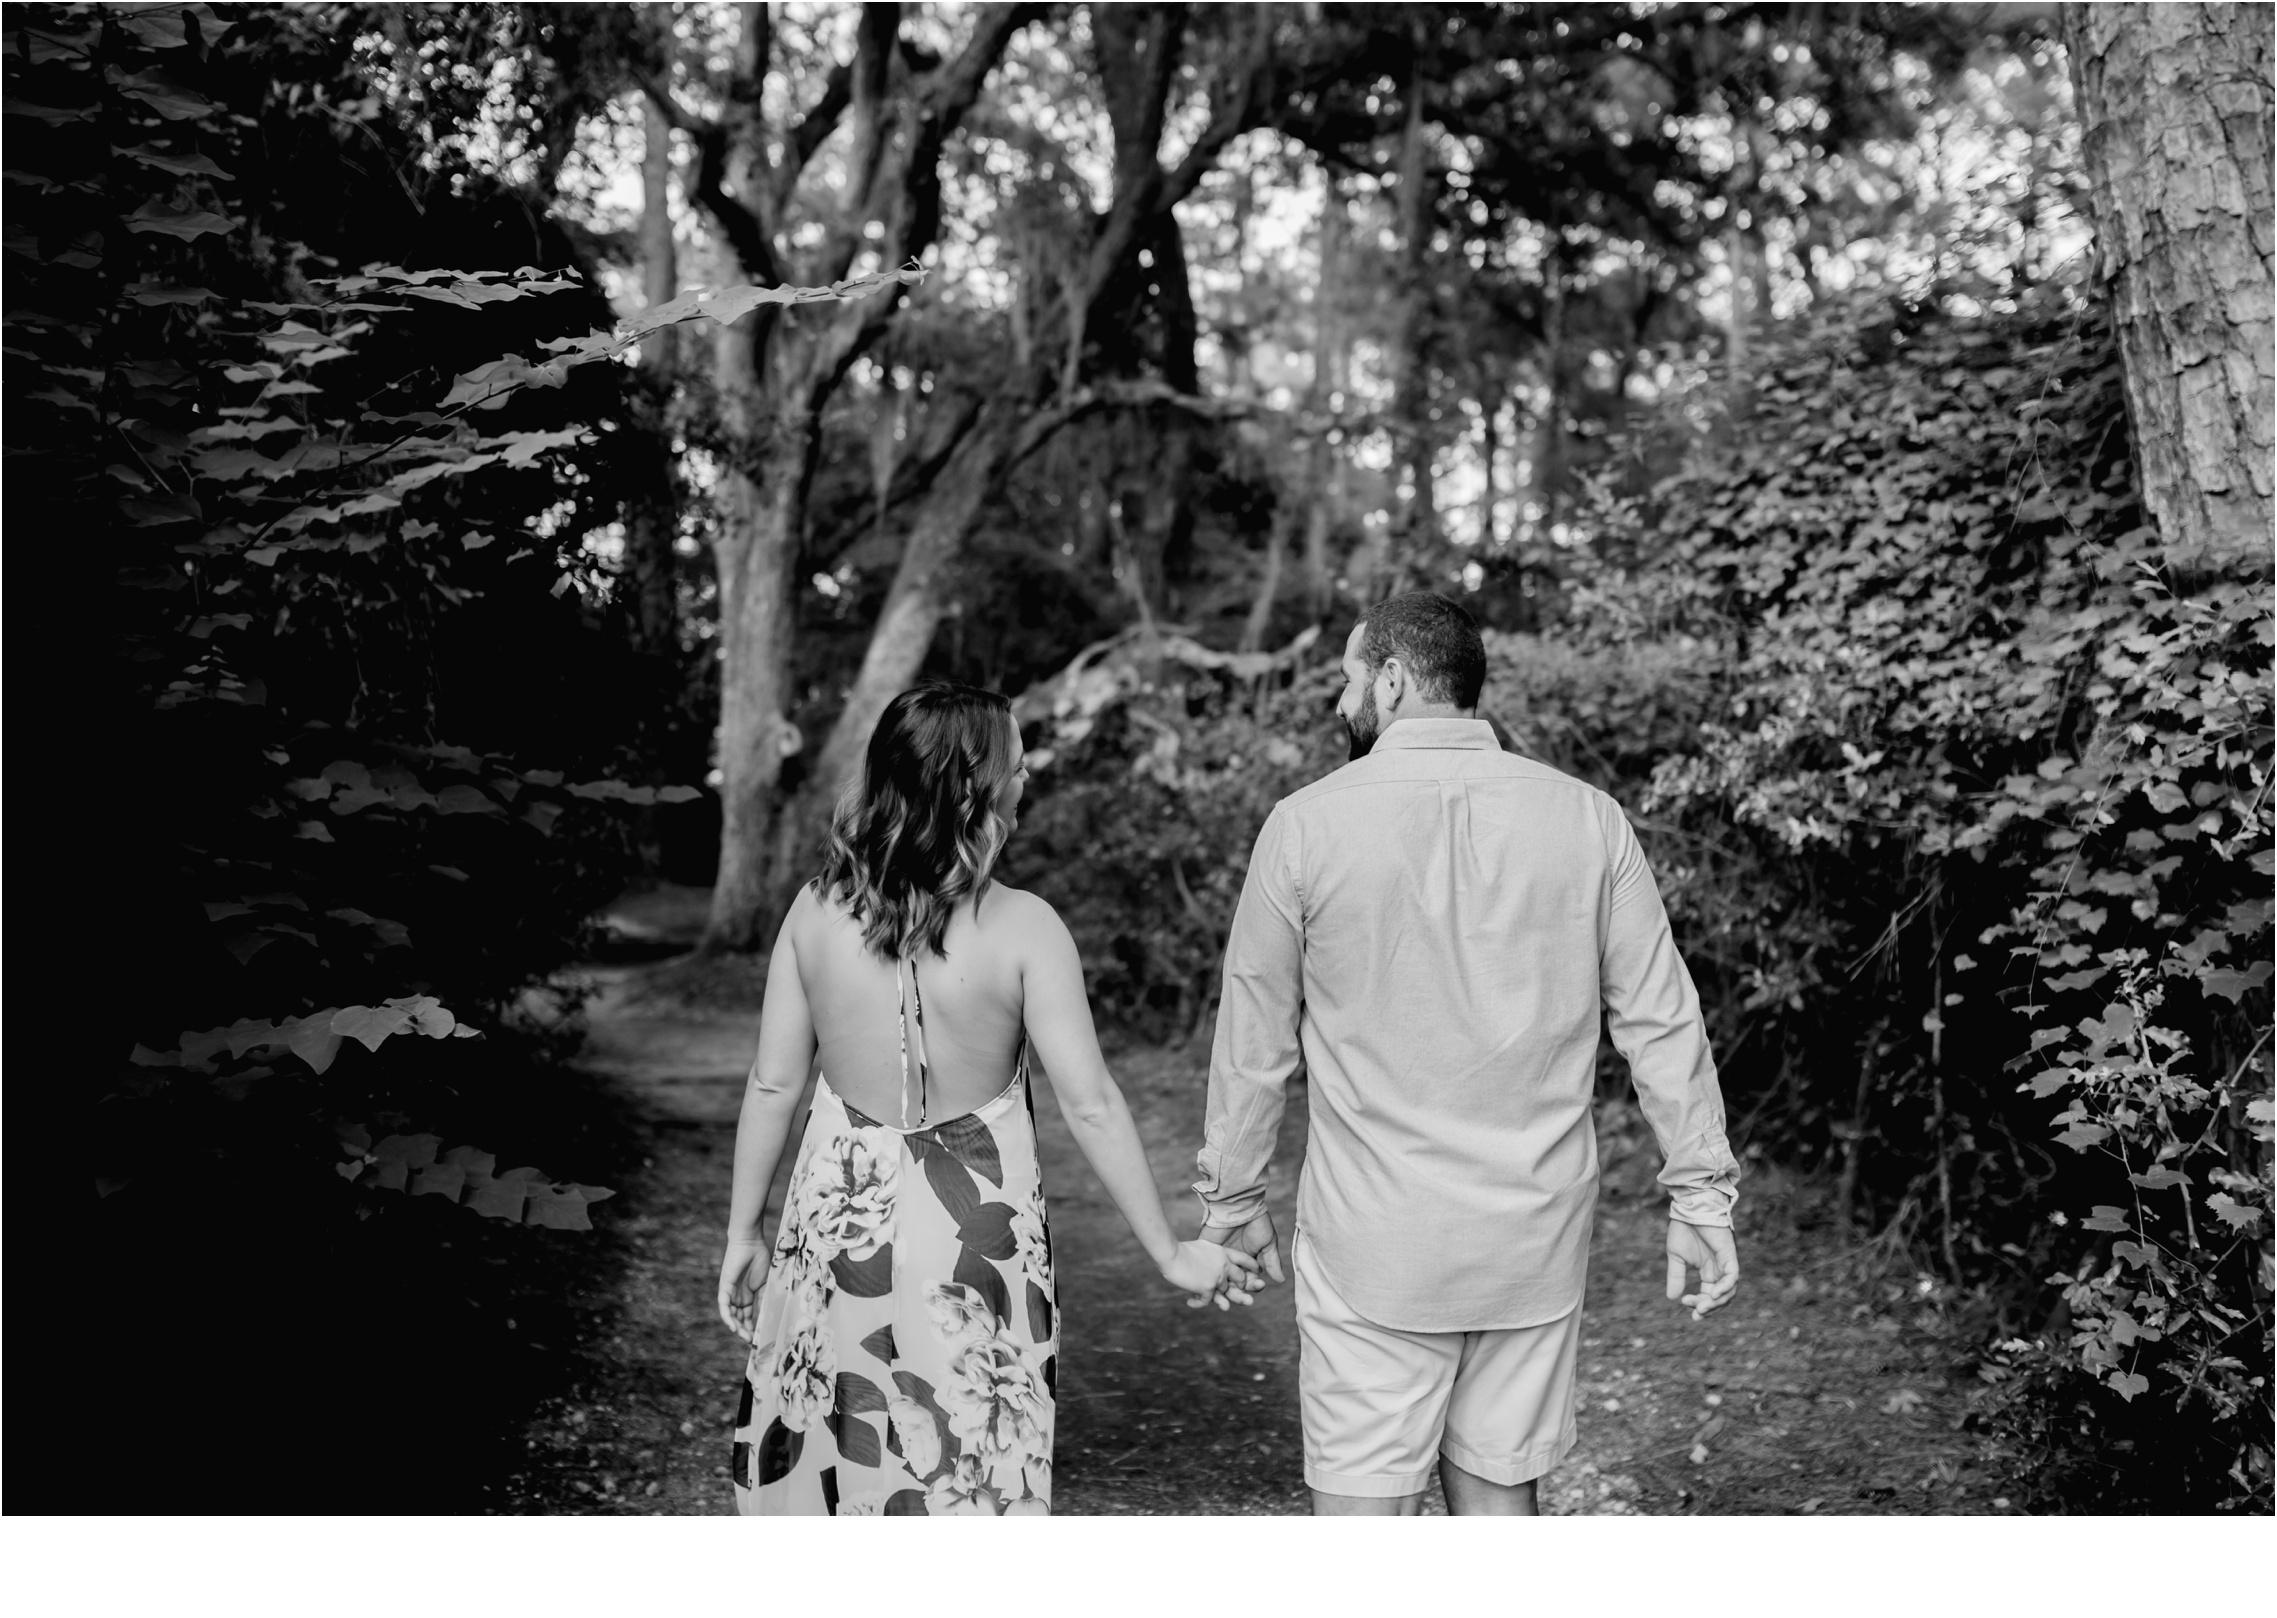 Rainey_Gregg_Photography_St._Simons_Island_Georgia_California_Wedding_Portrait_Photography_0136.jpg